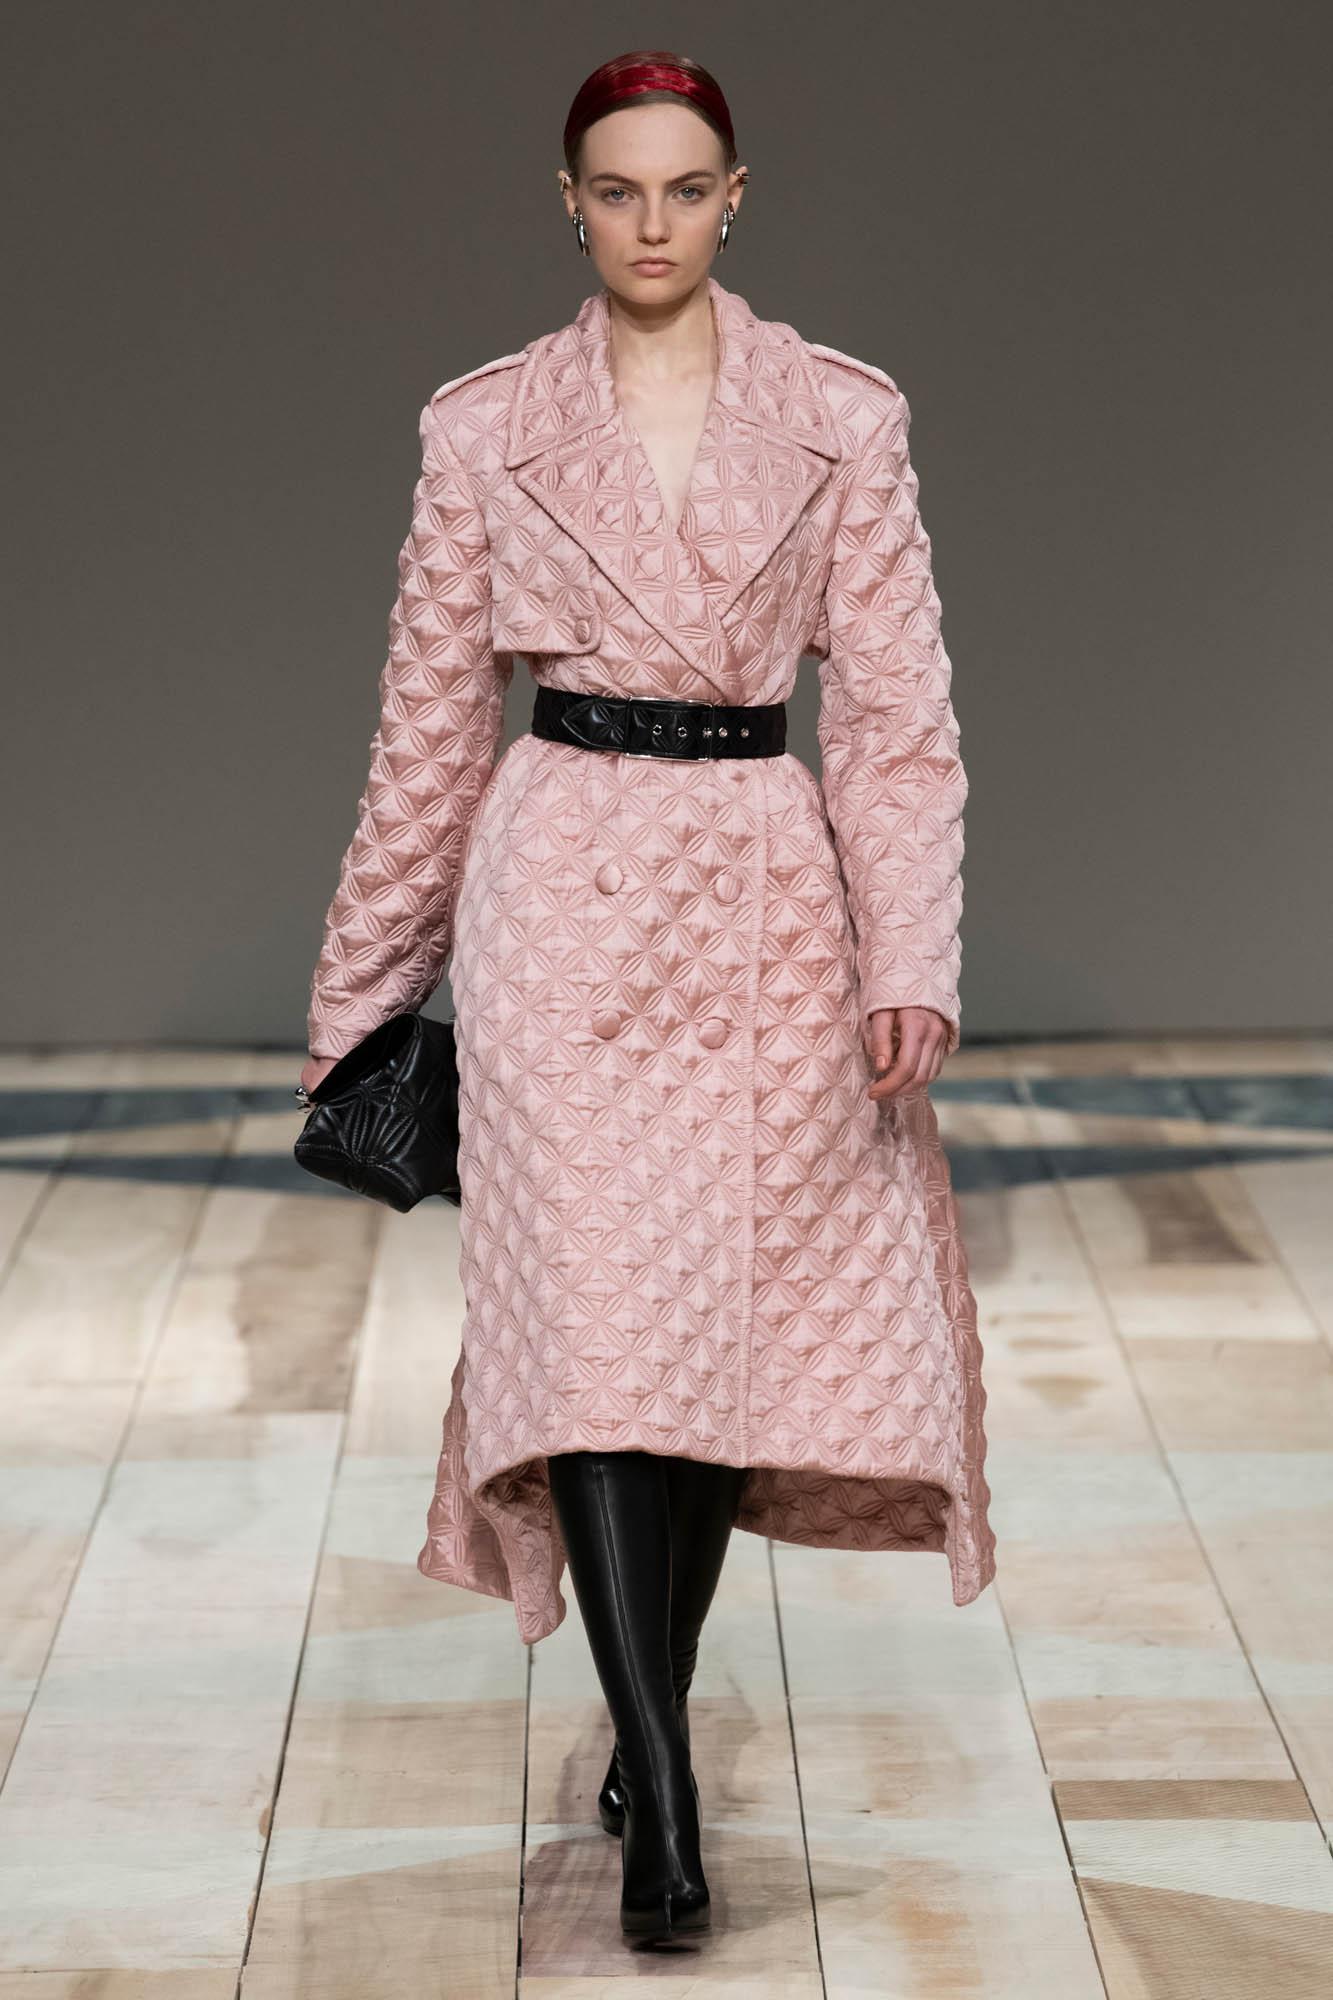 Alexander McQueen Woman 2020-21